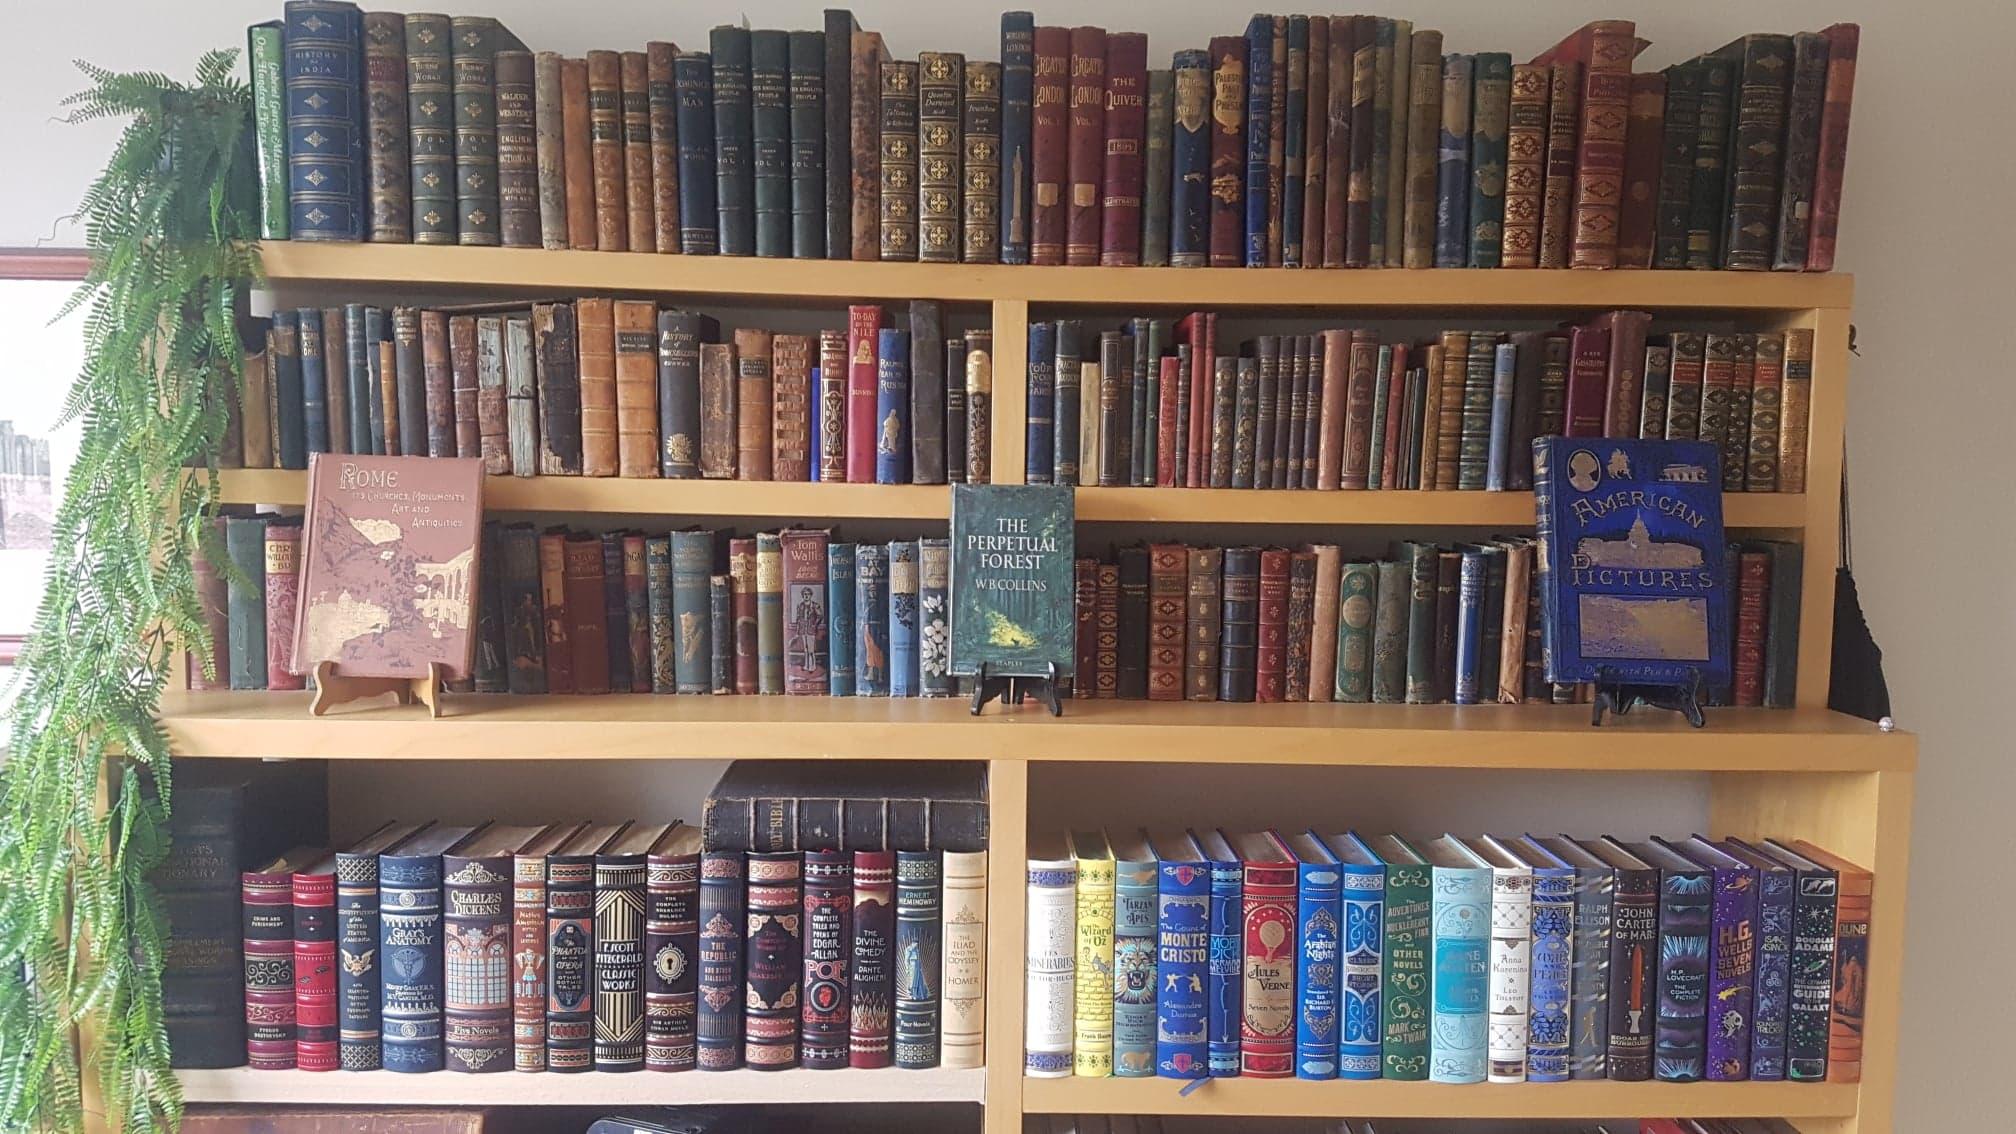 My Bookshelf Today